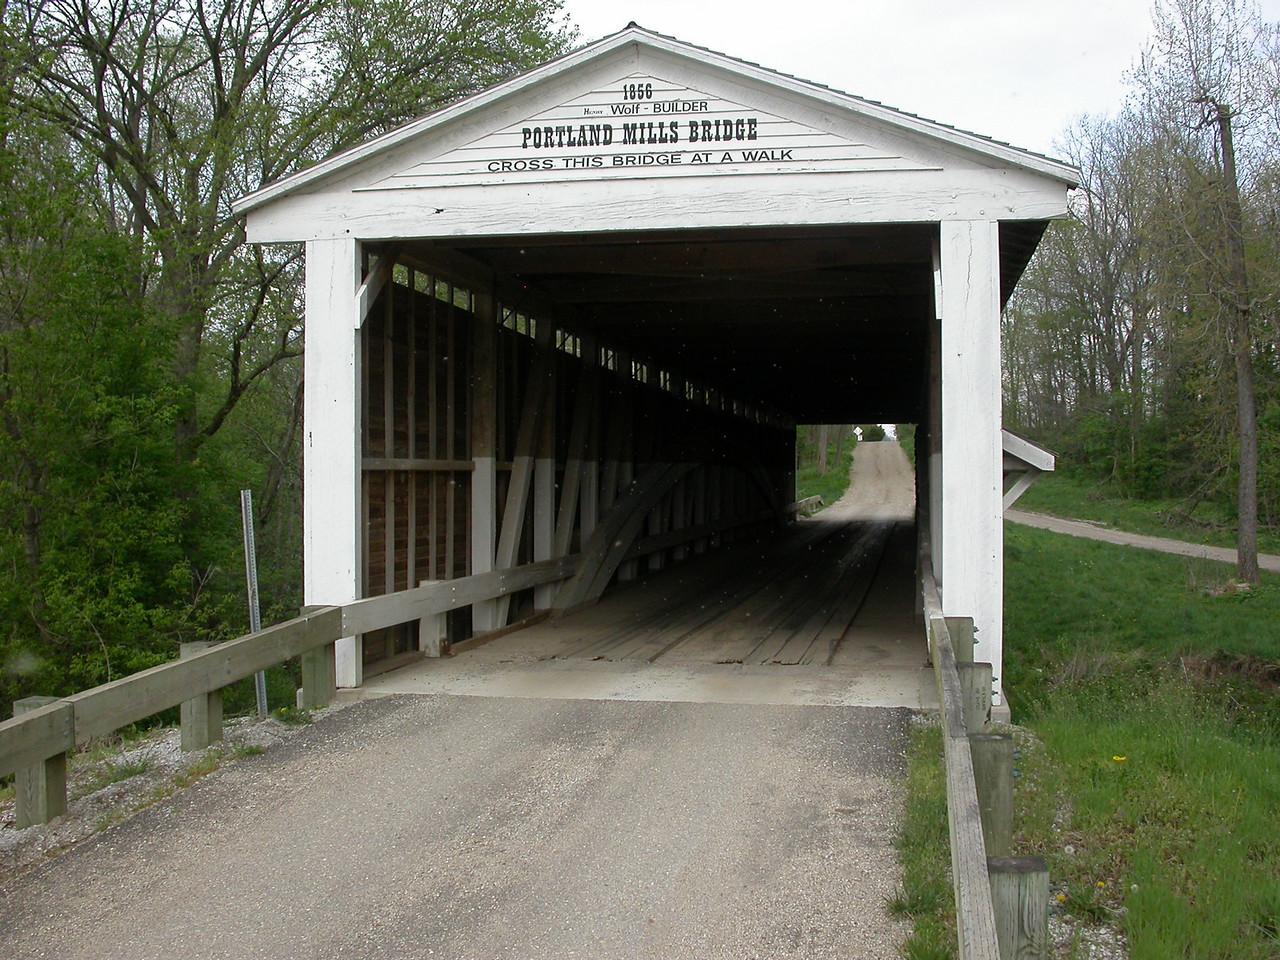 Portland Mills Covered Bridge, Parke County, Indiana, April 2004